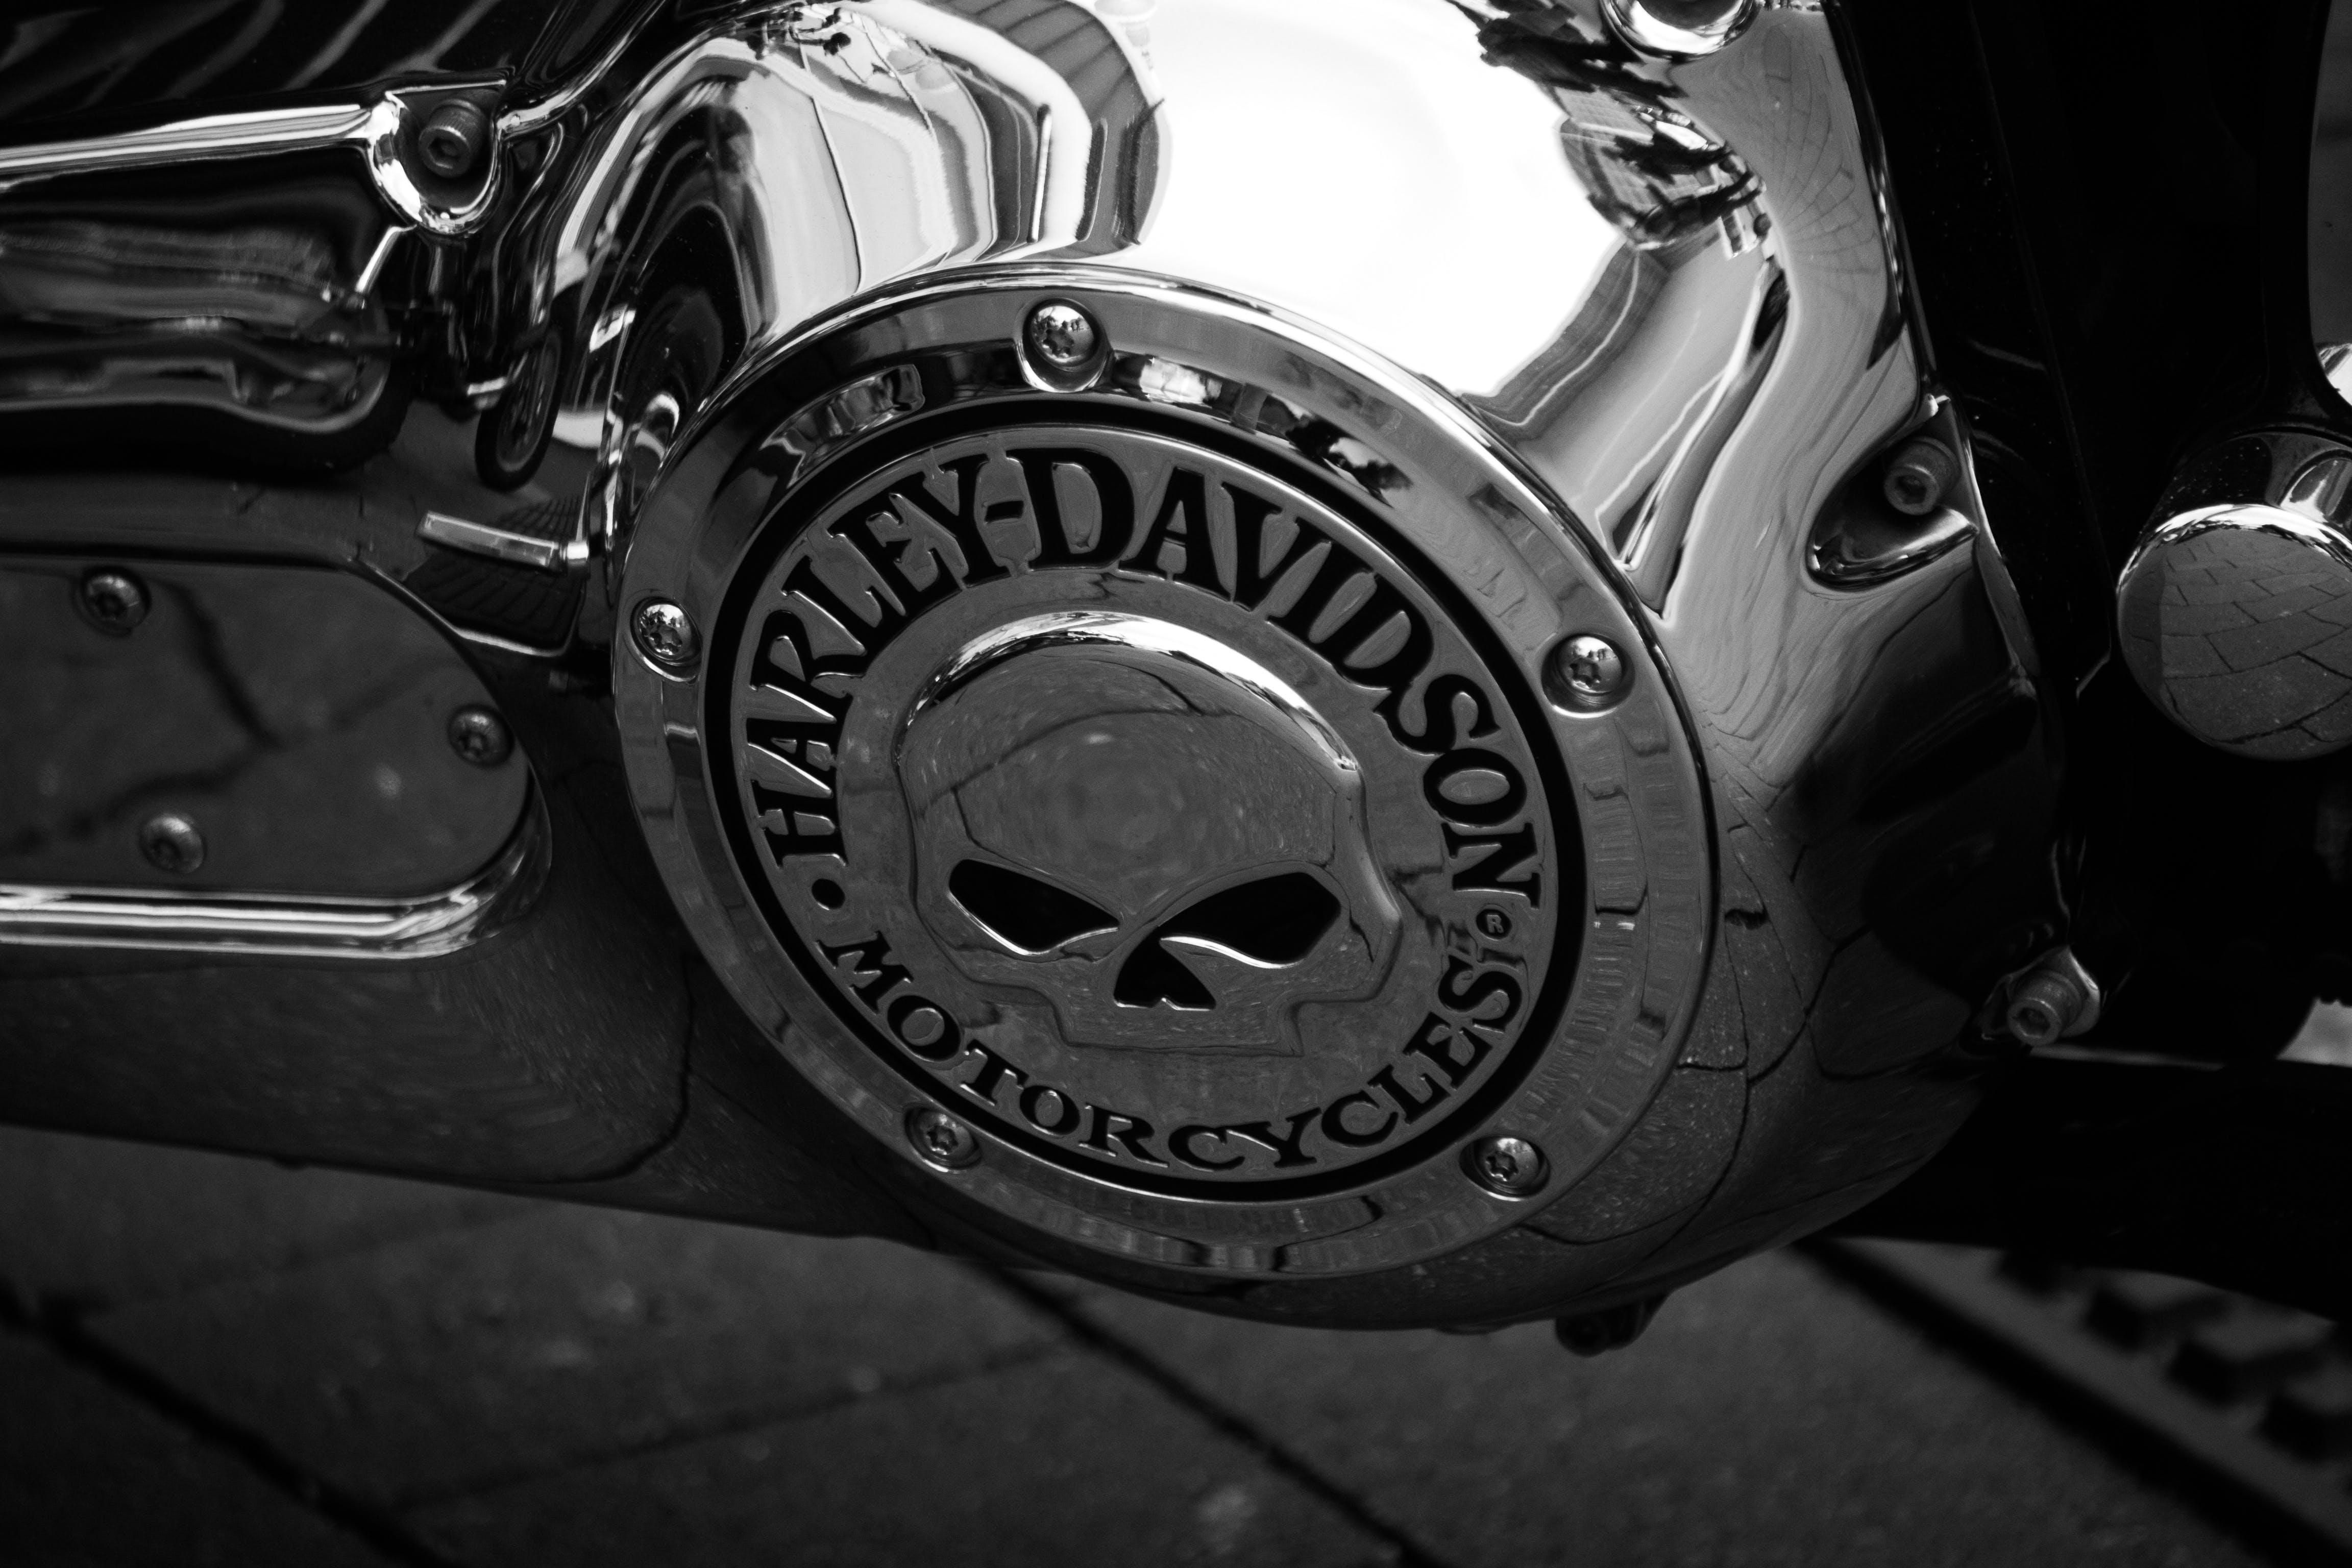 Free stock photo of bike, bikes, BMW, Davidson